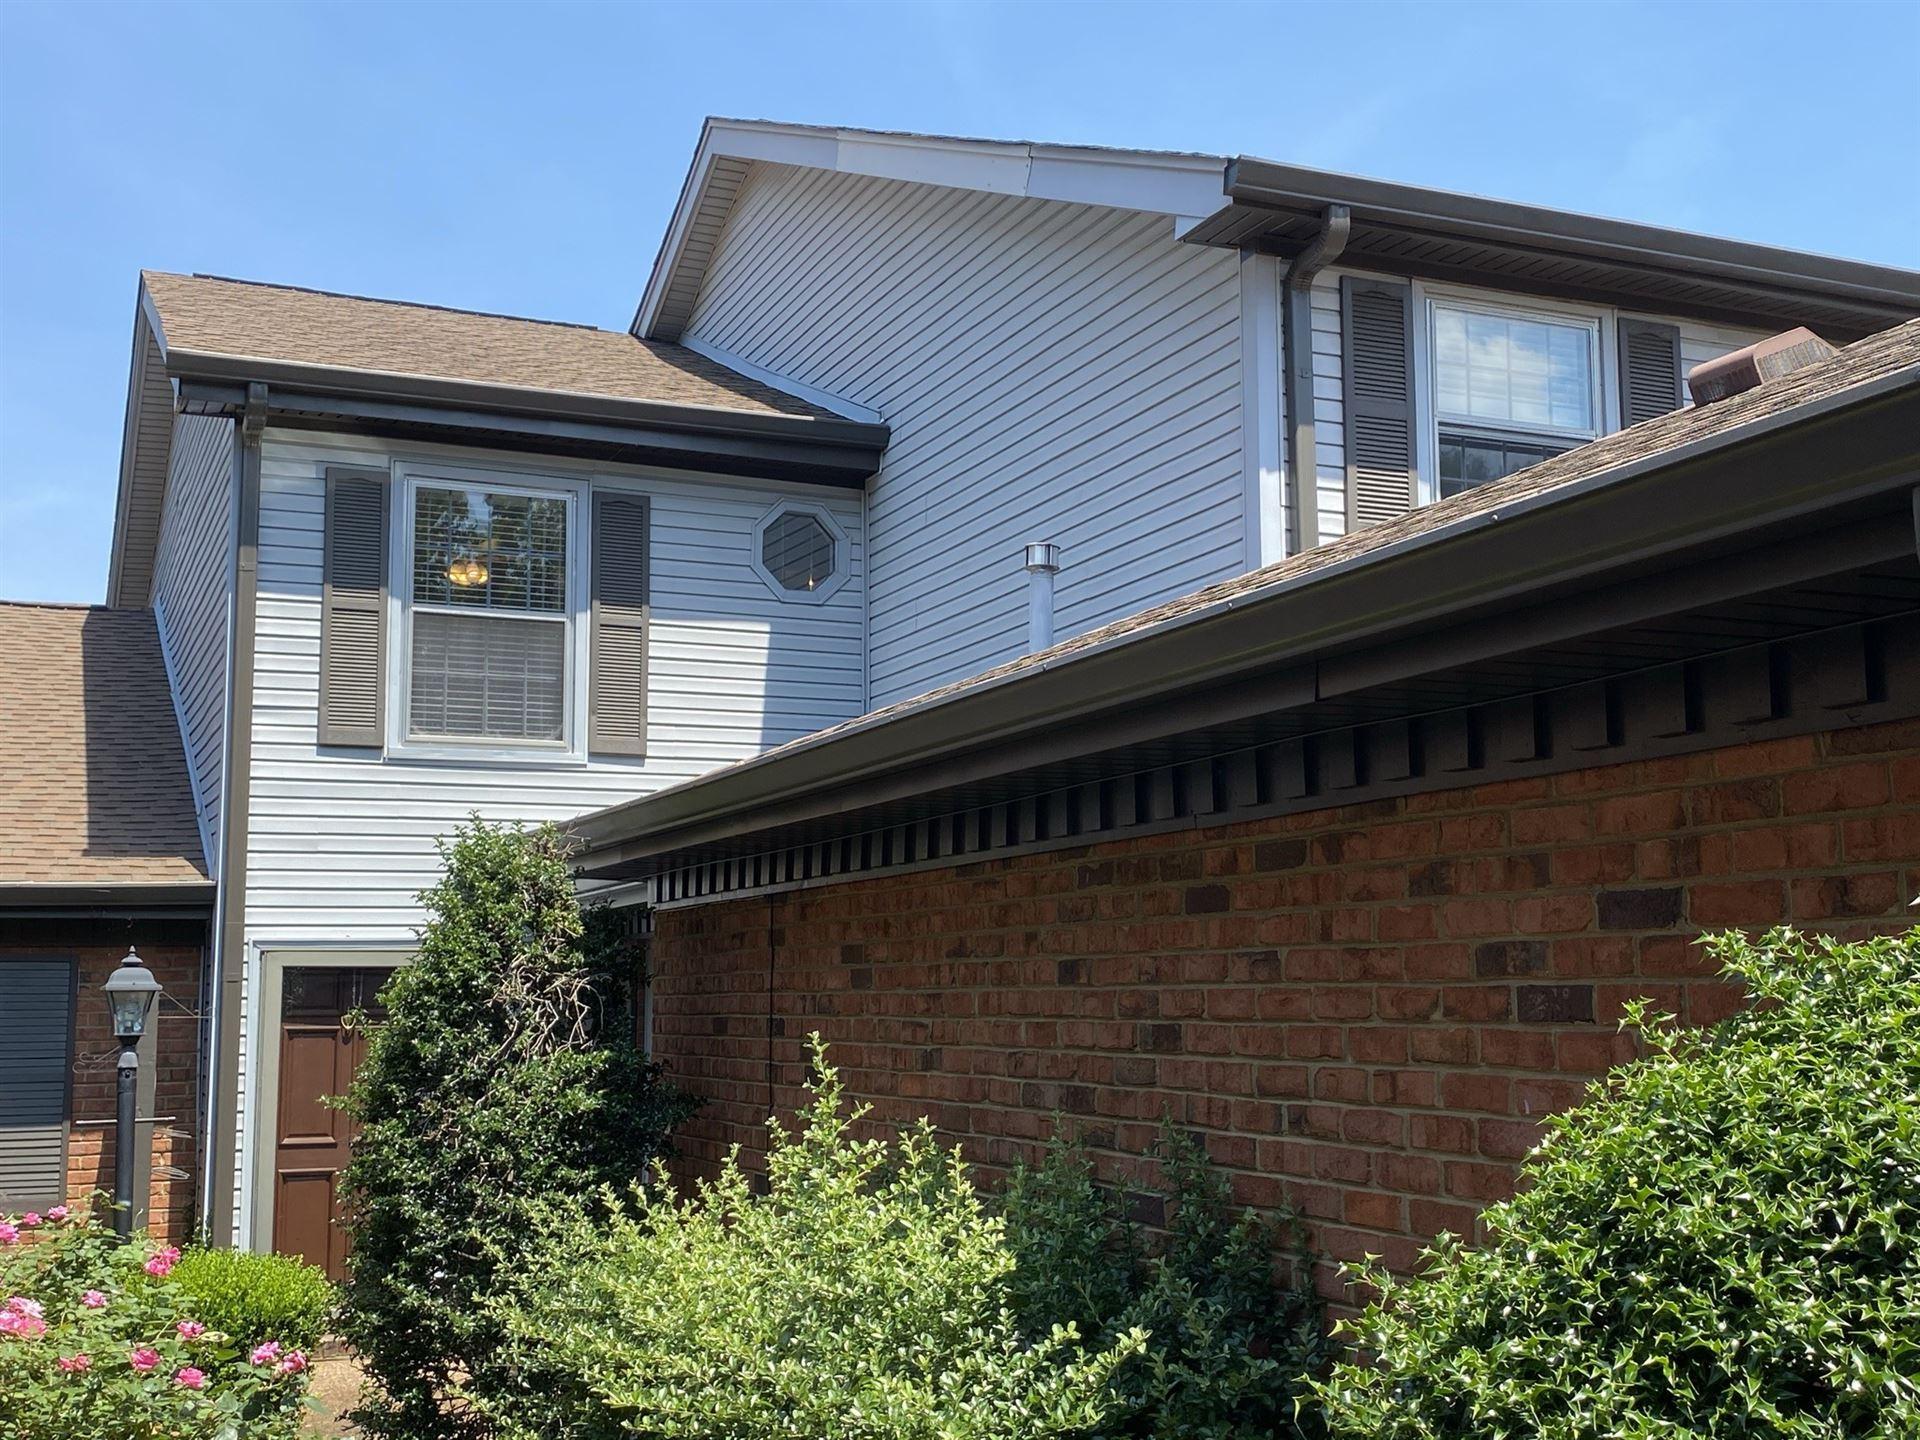 Photo of 125 Hearthstone Manor Cir, Brentwood, TN 37027 (MLS # 2259162)